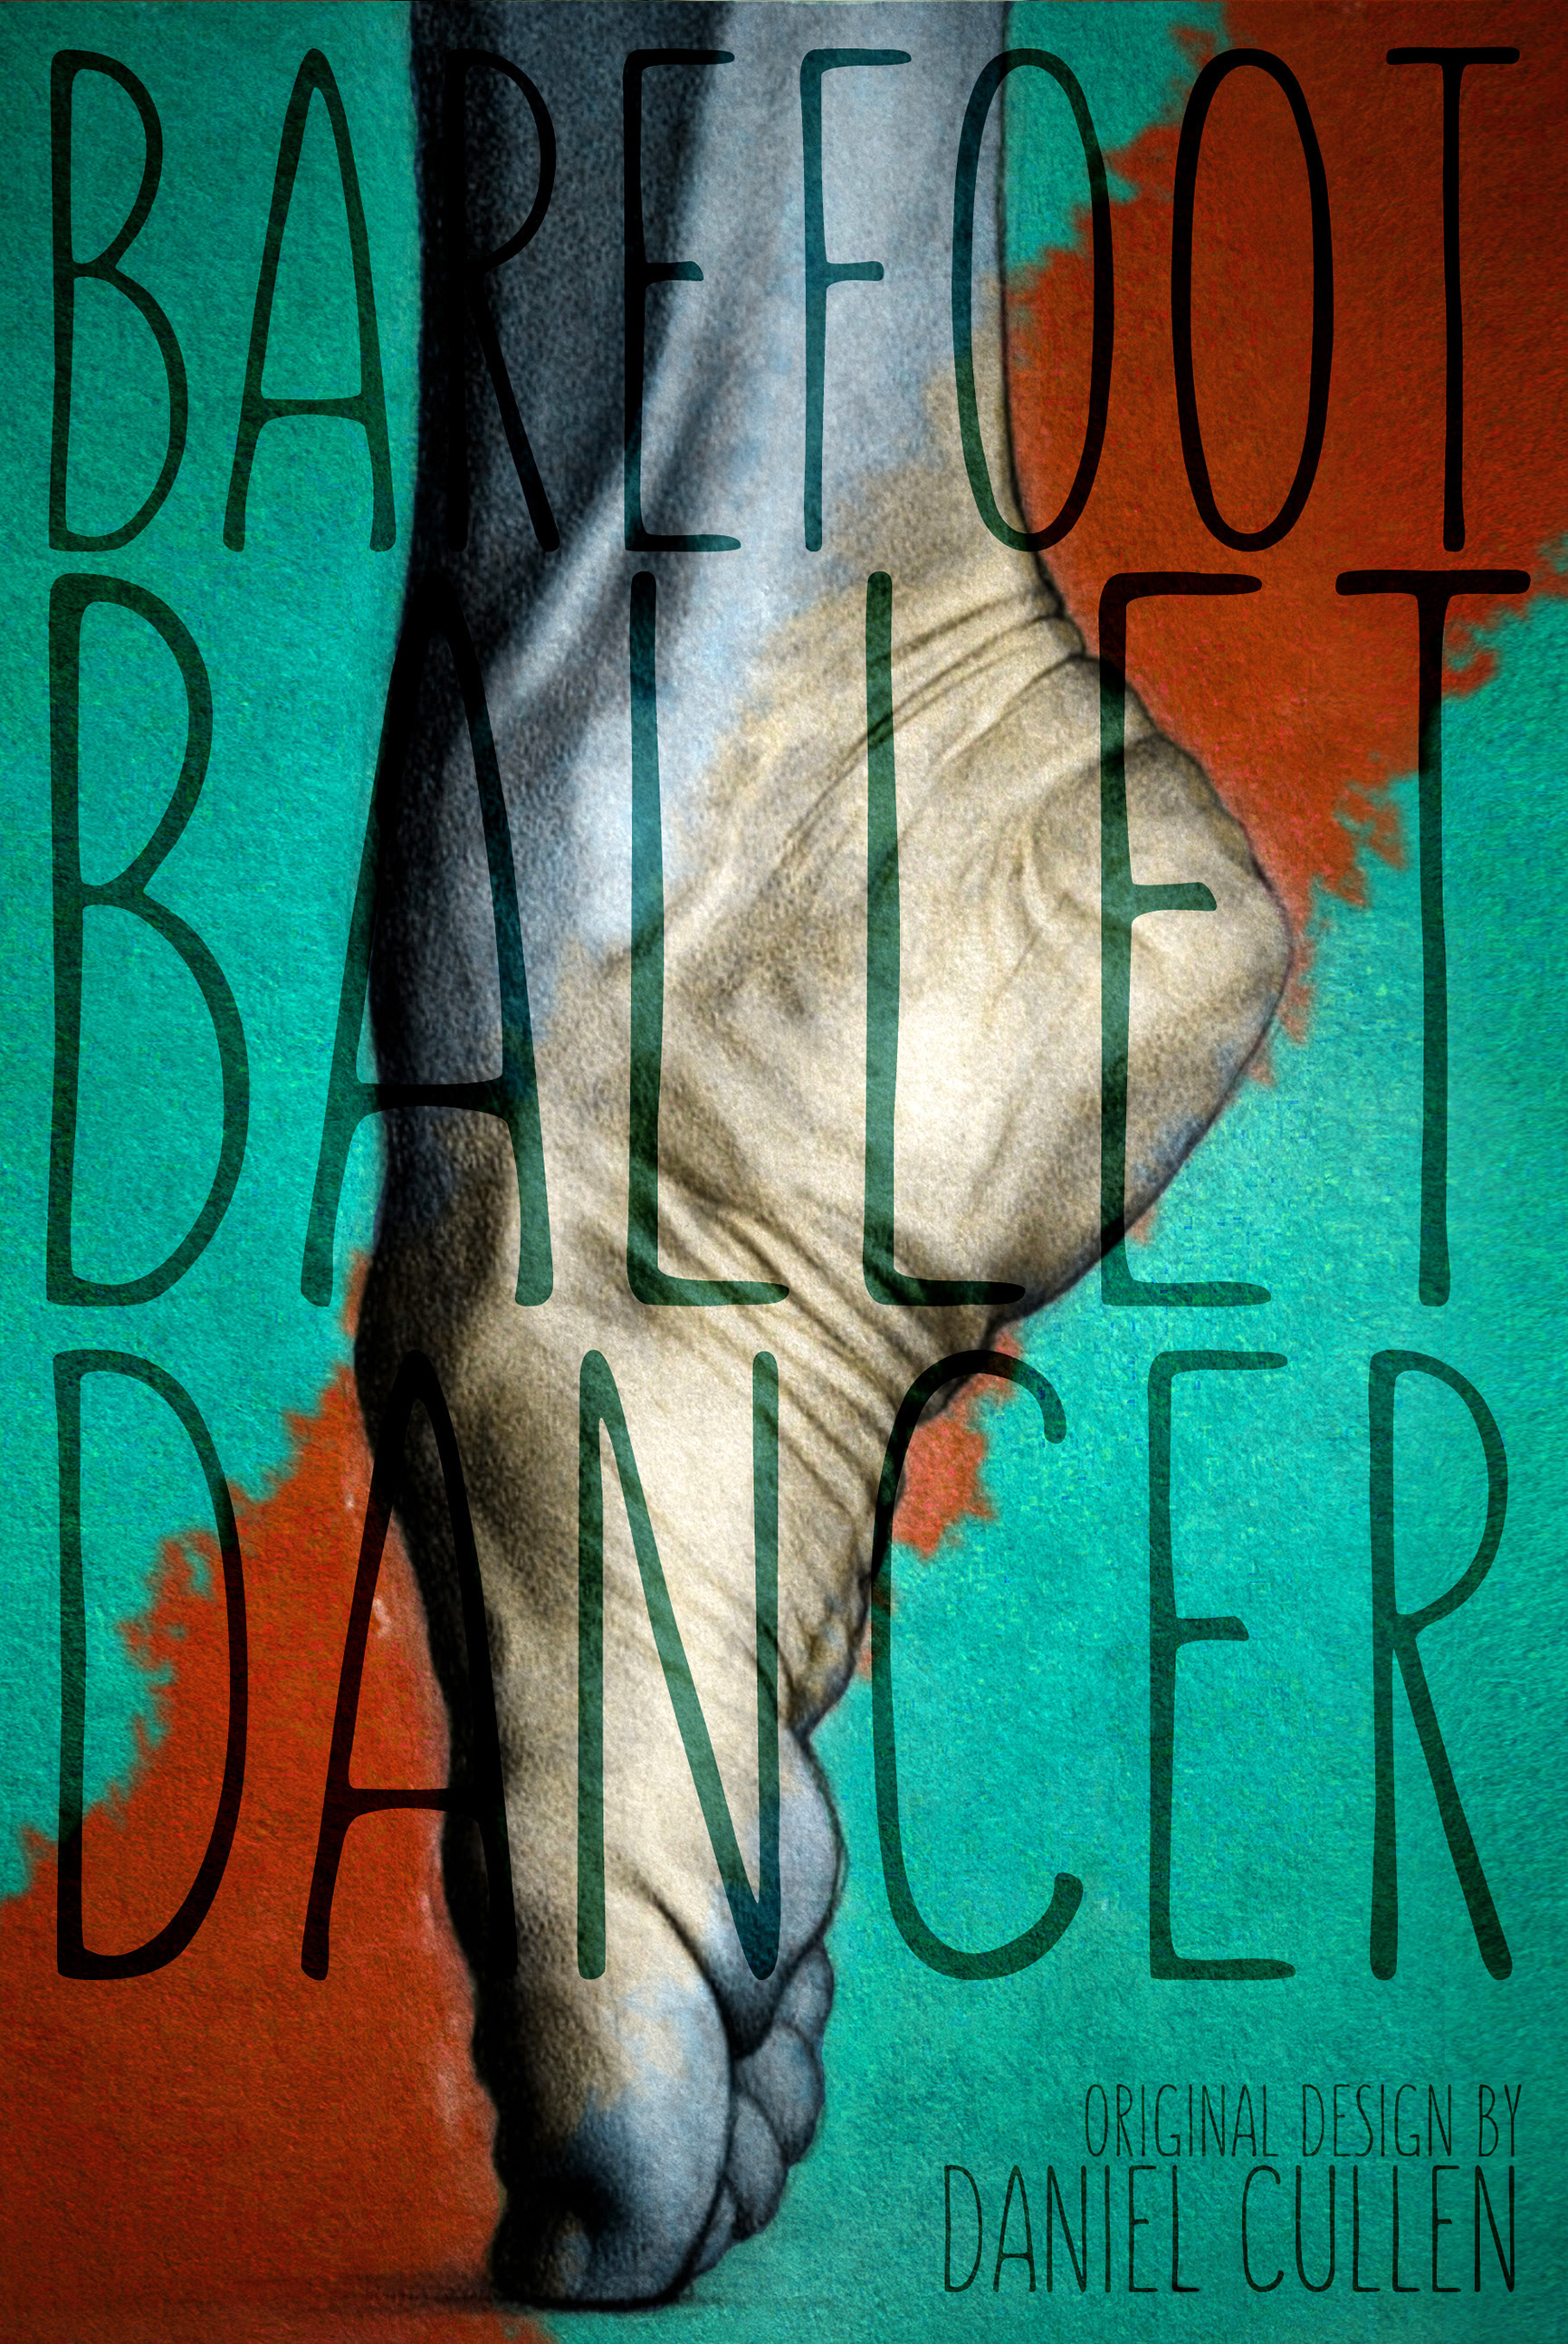 Barefoot Ballet Dancer